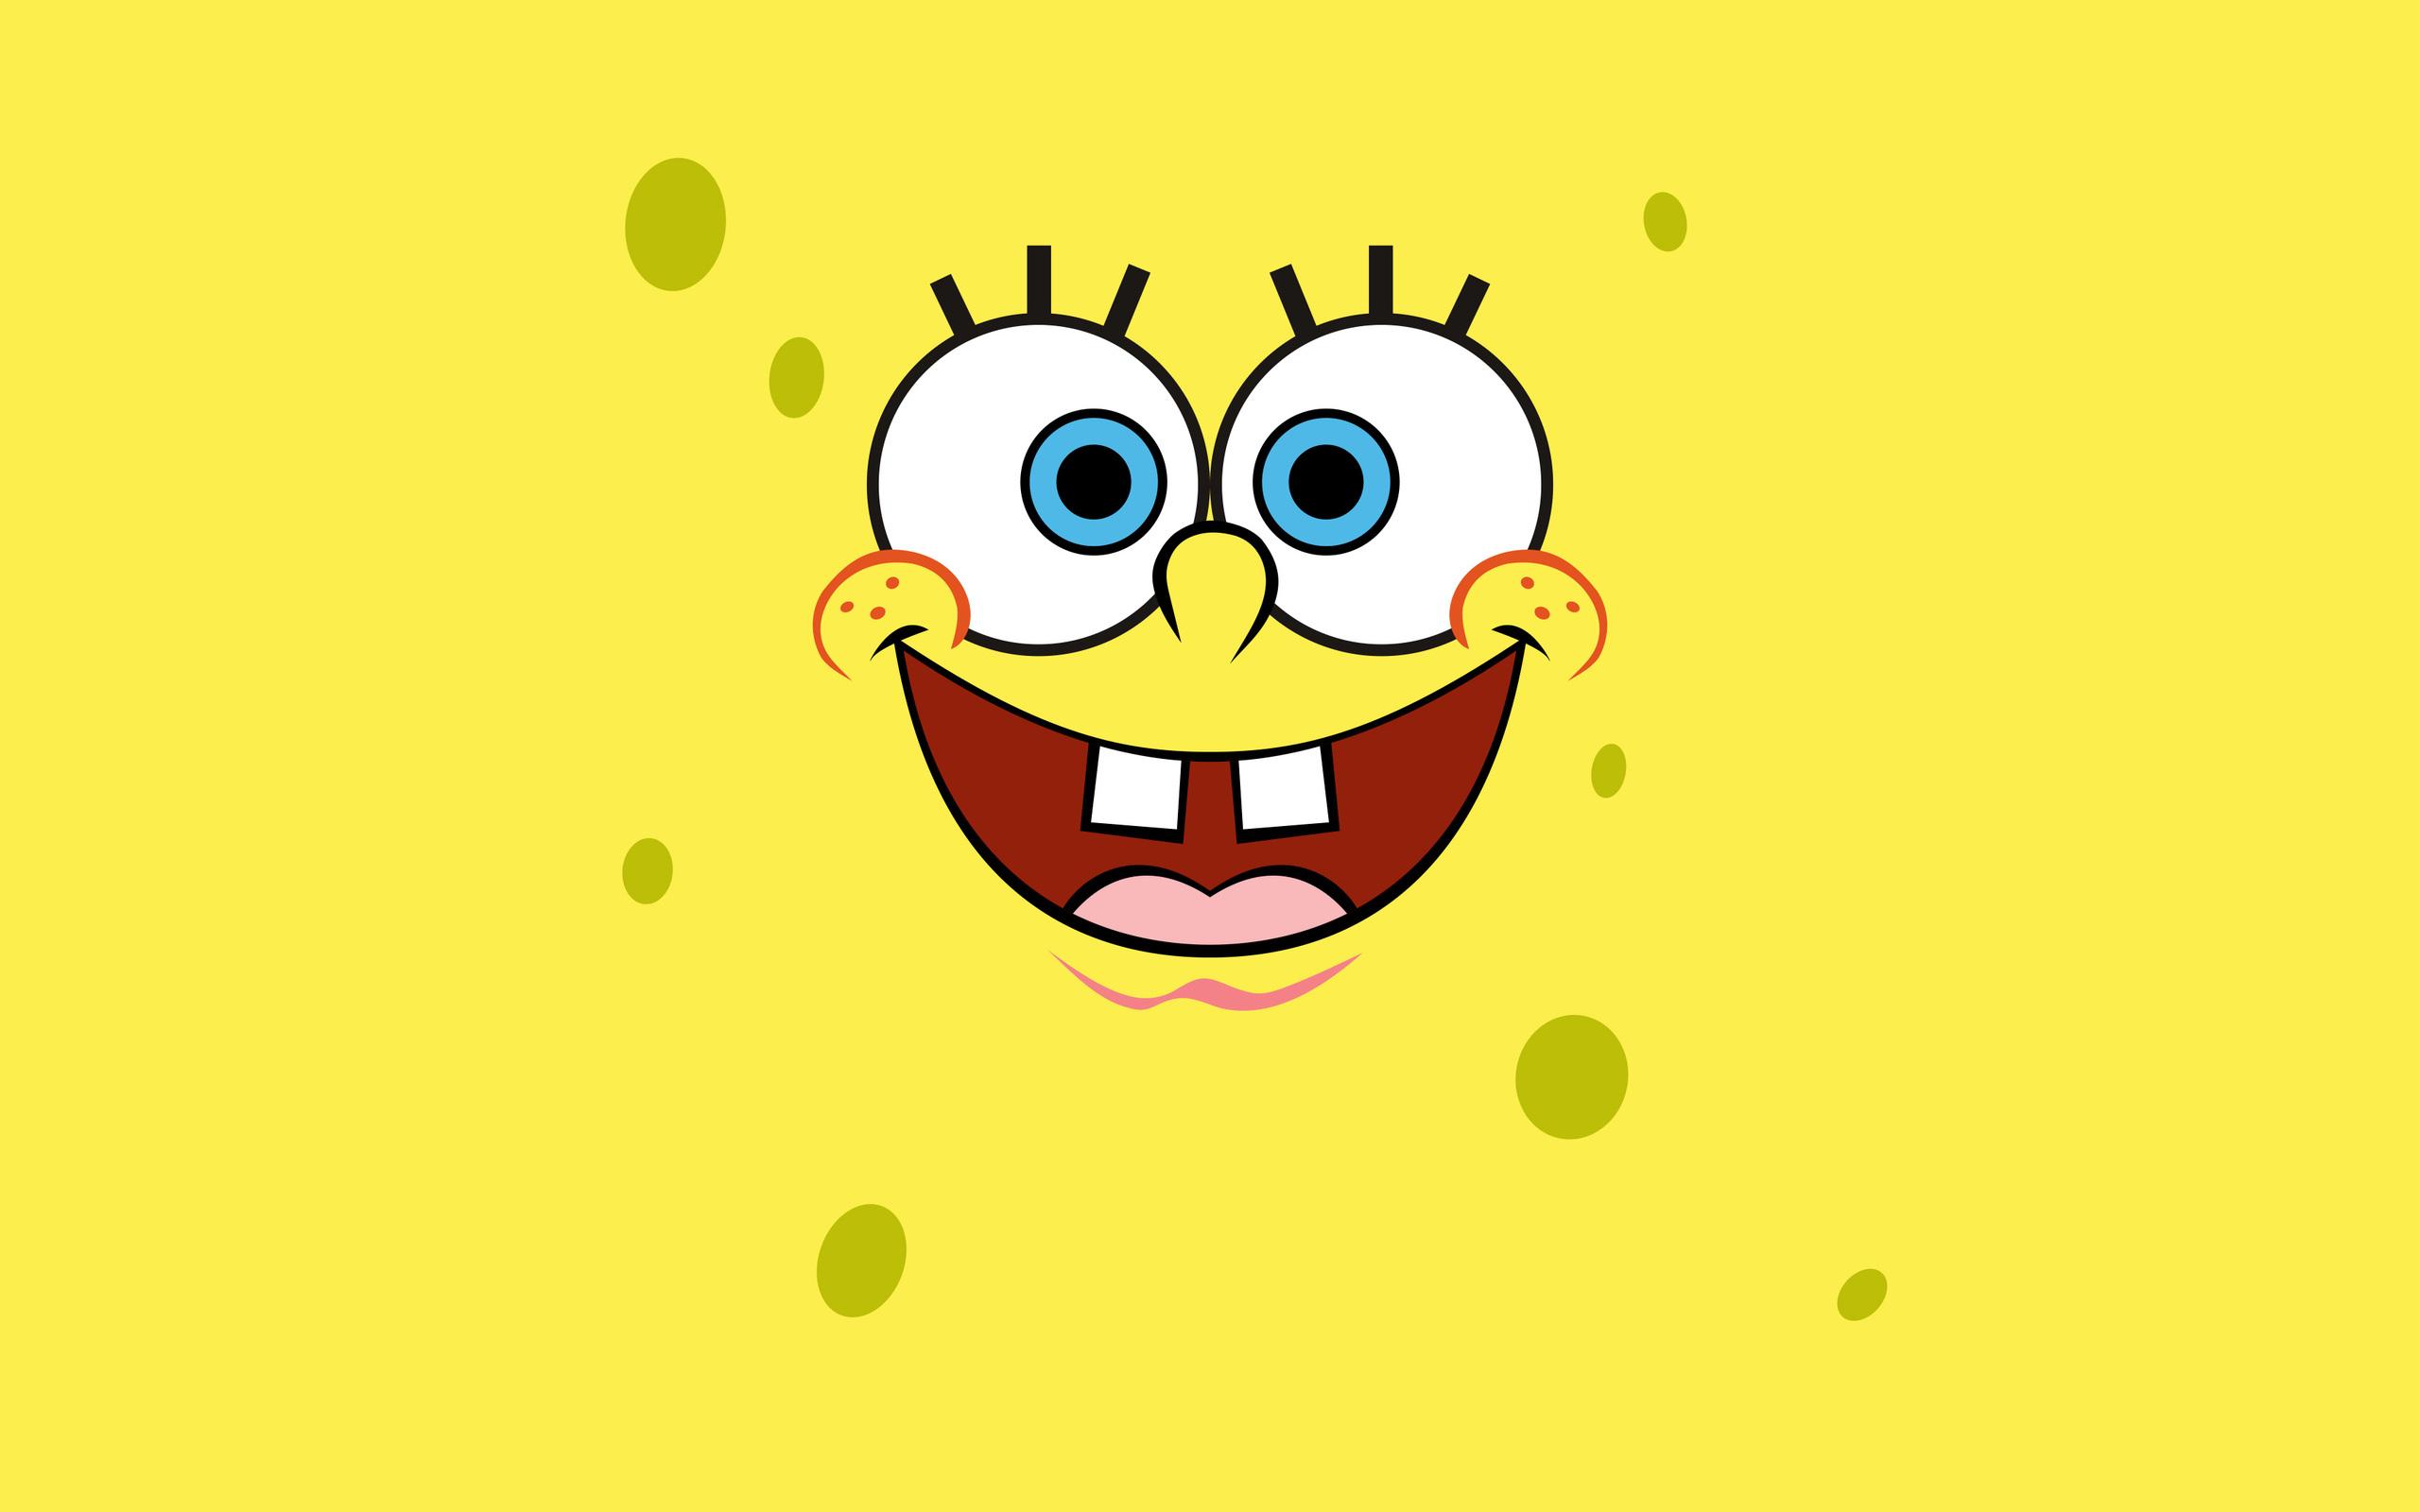 spongebob-squarepants-minimalist-4k-nc.jpg